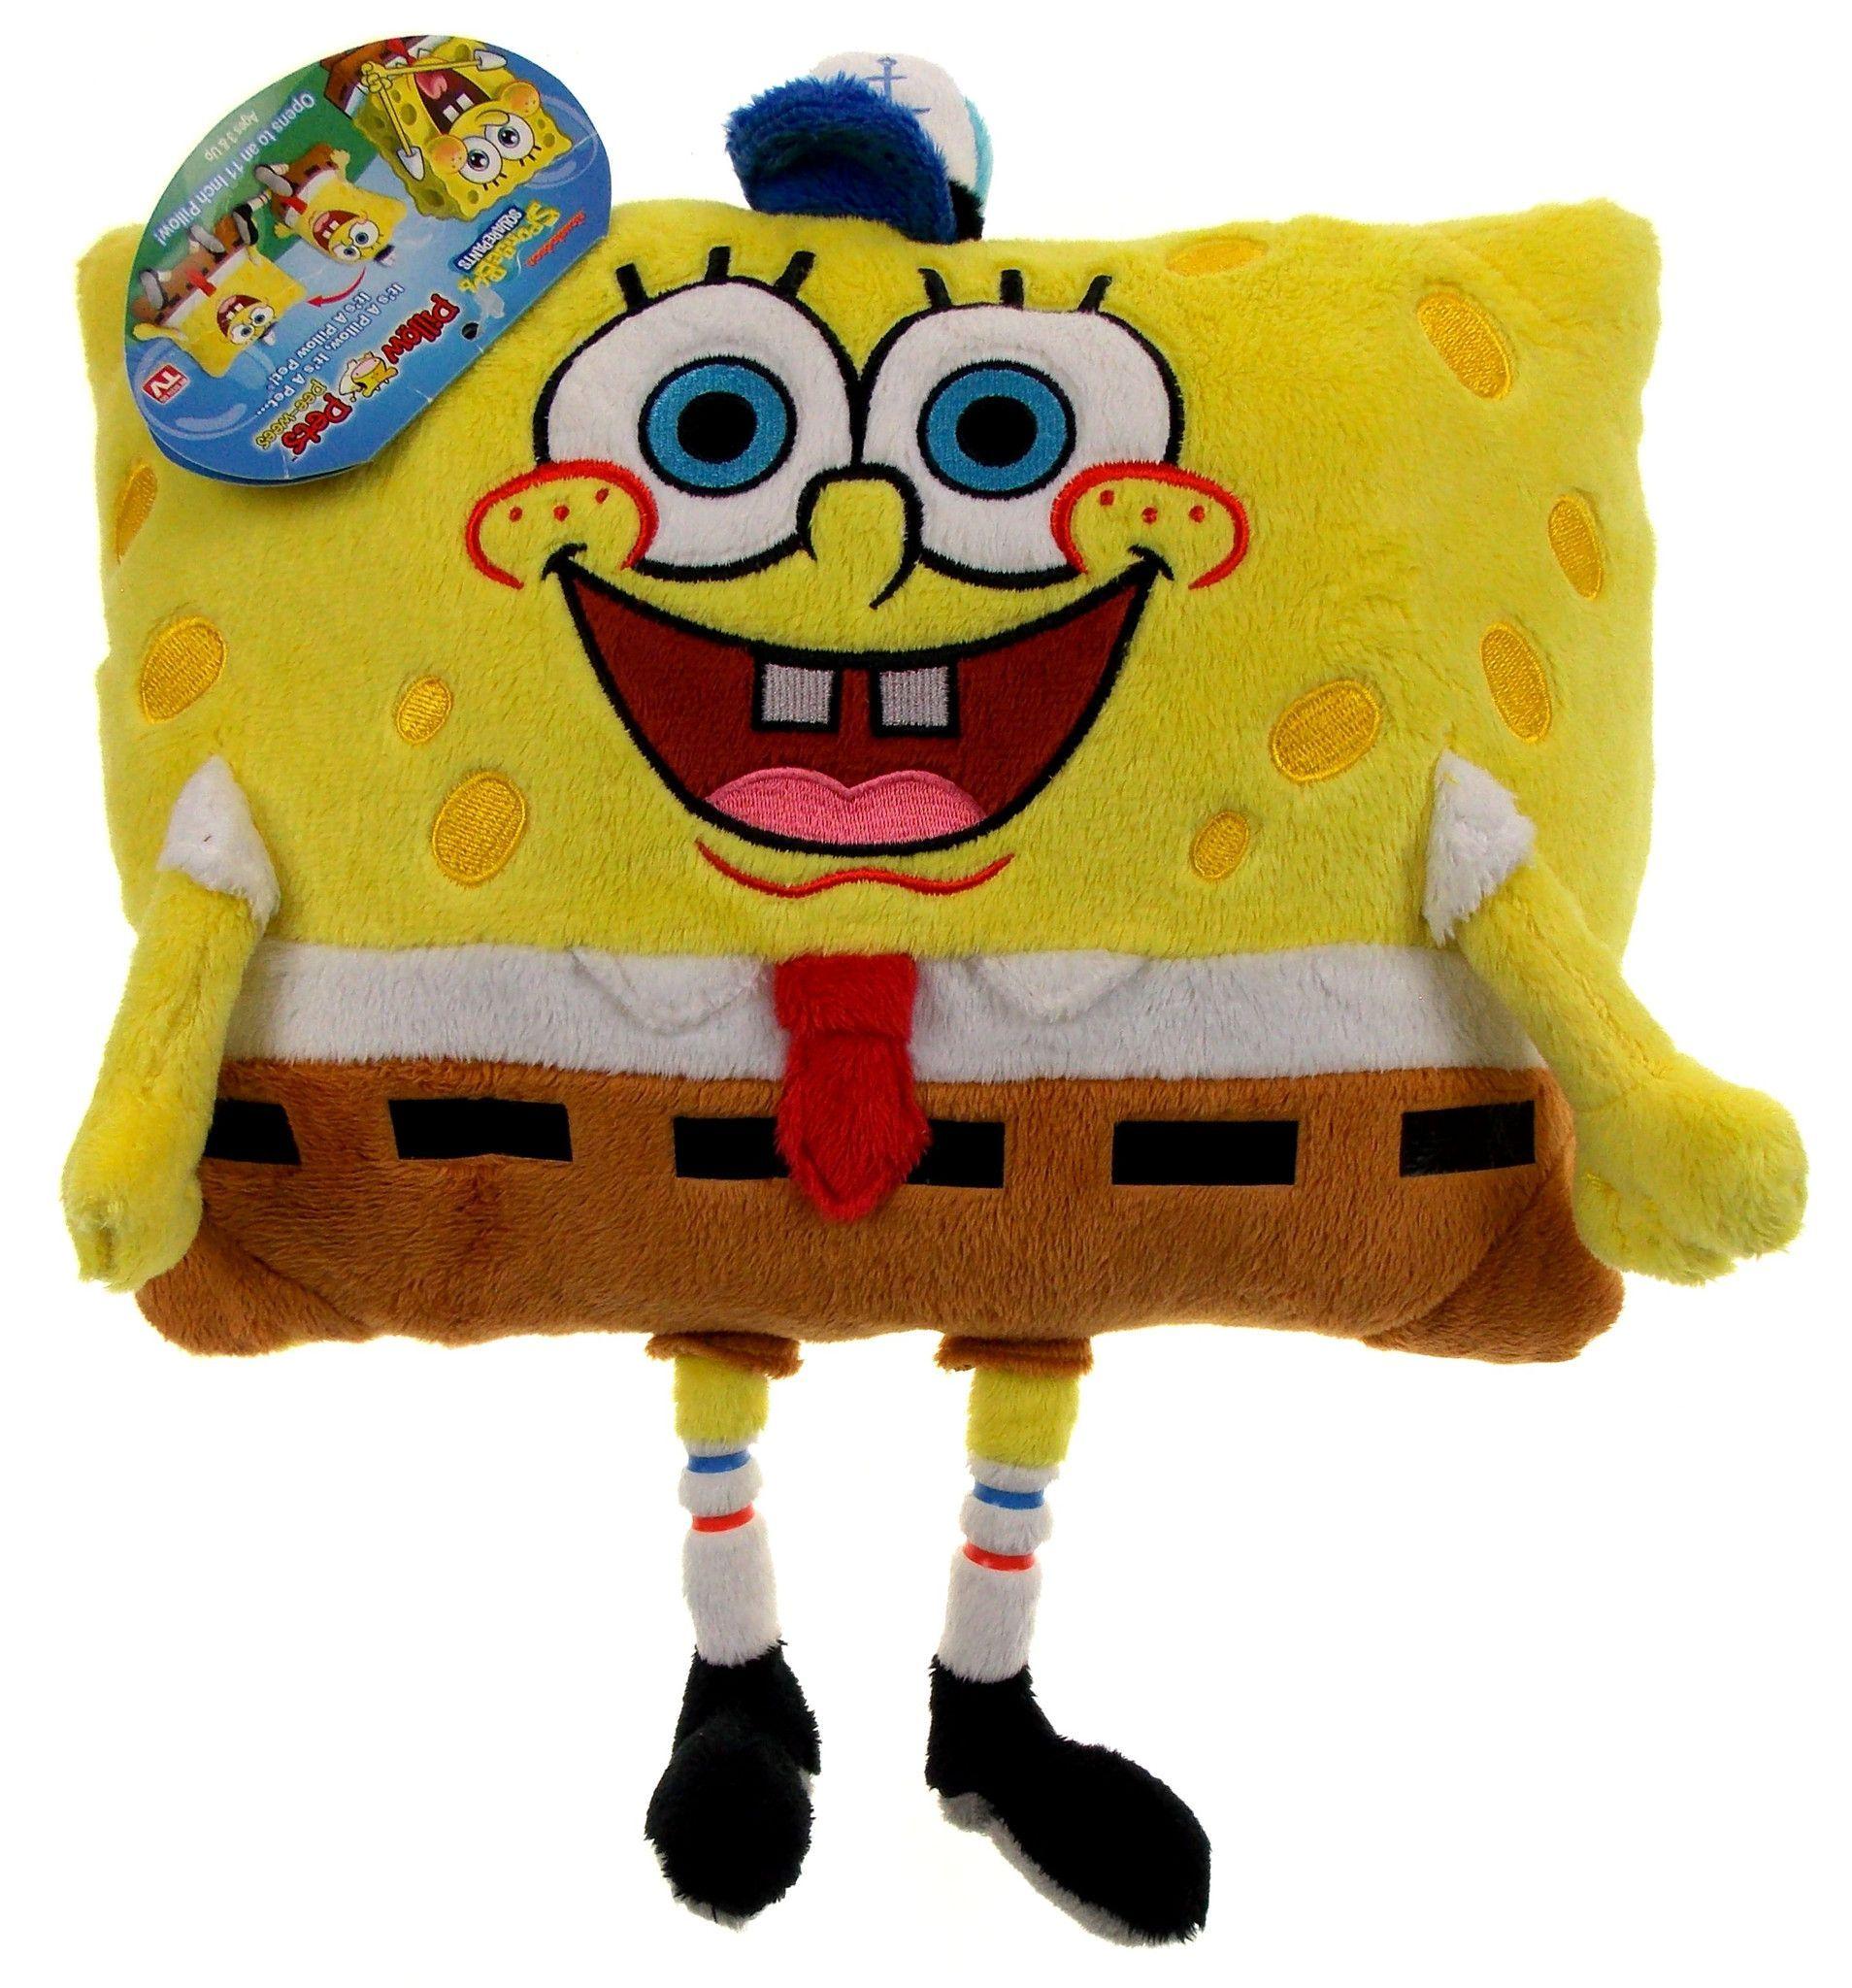 Pillow Pets 11 Pee Wees Spongebob Squarepants Plush Stuffed Animal Nickelodeon Animal Pillows Spongebob Cute Stuffed Animals